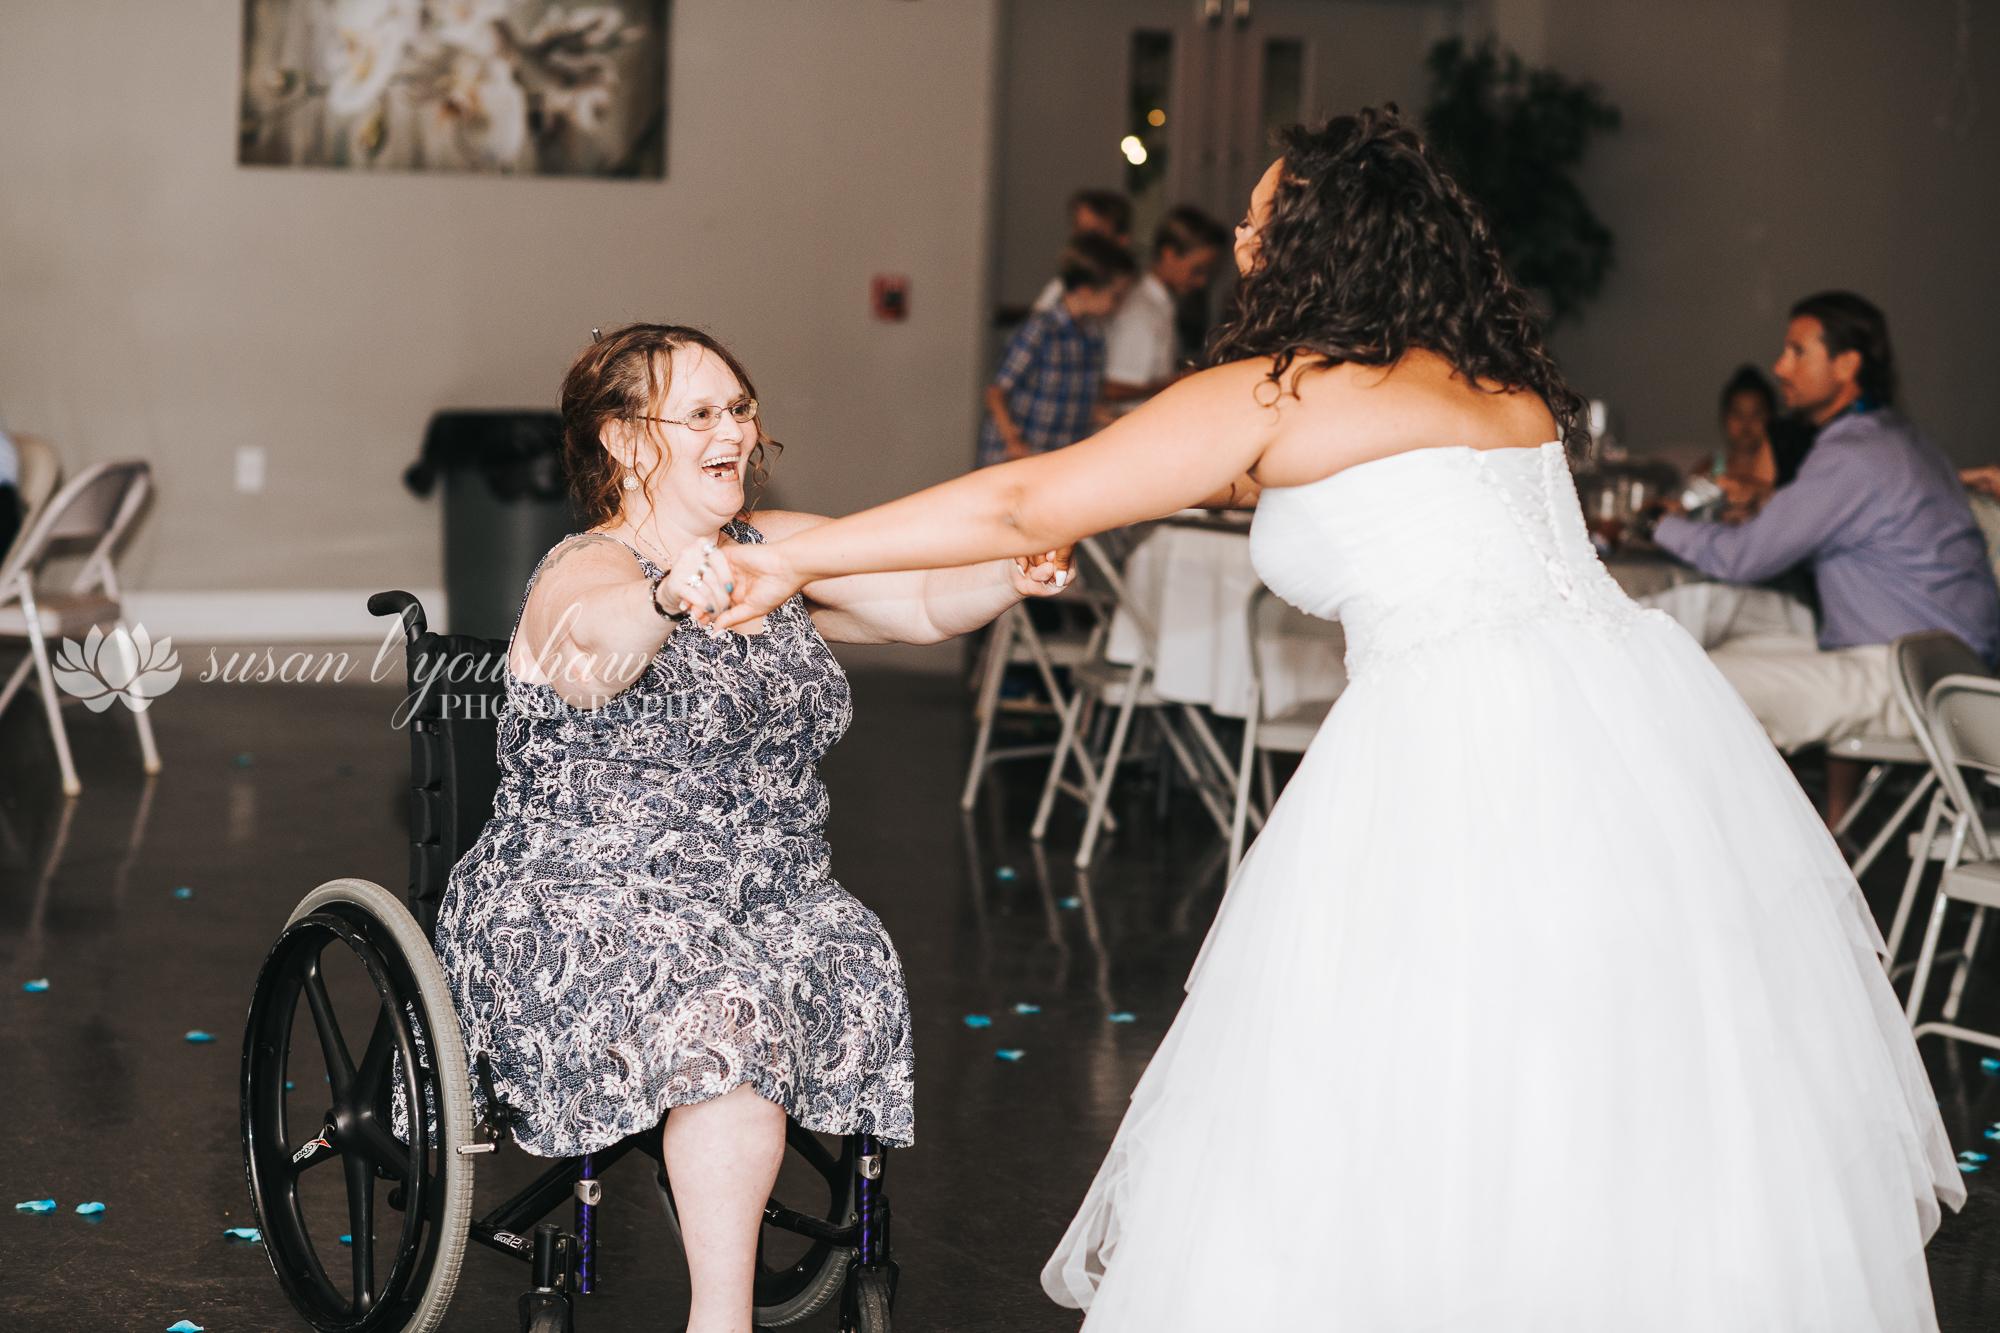 Katelyn and Wes Wedding Photos 07-13-2019 SLY Photography-122.jpg